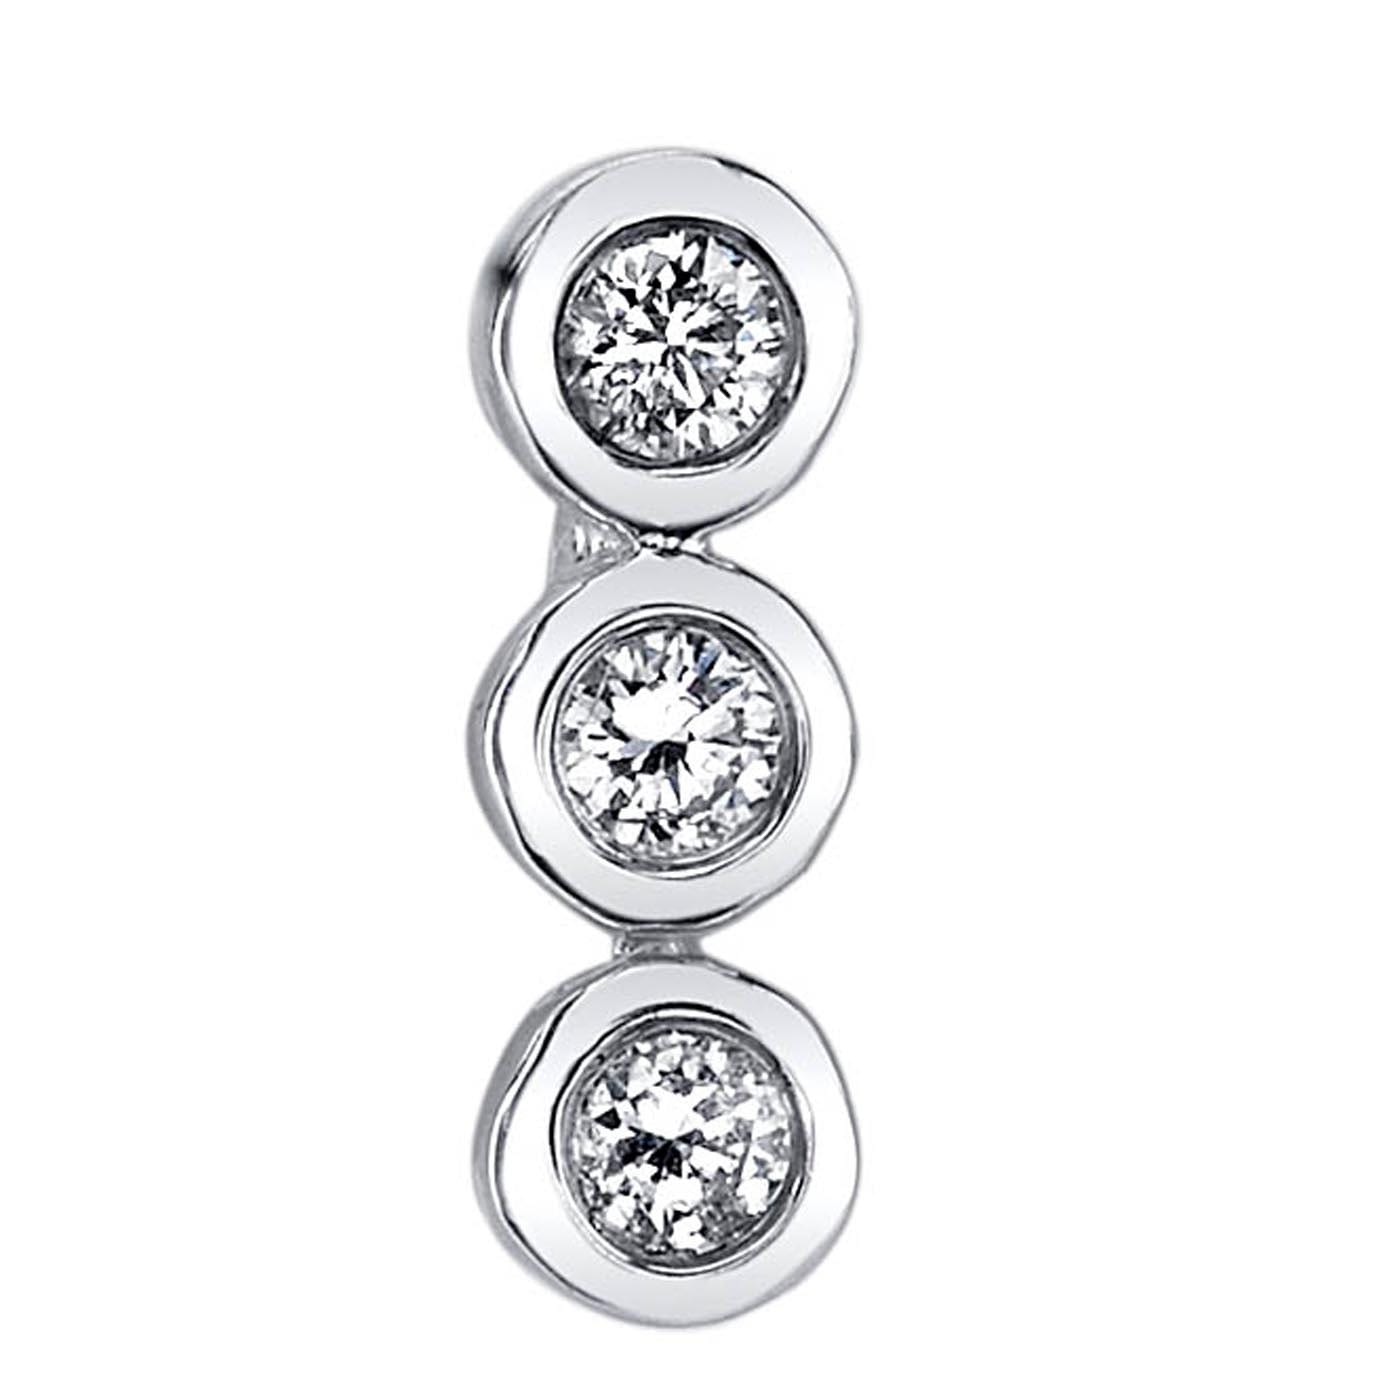 Diamond Earrings - Studs Style #: MARS-26833